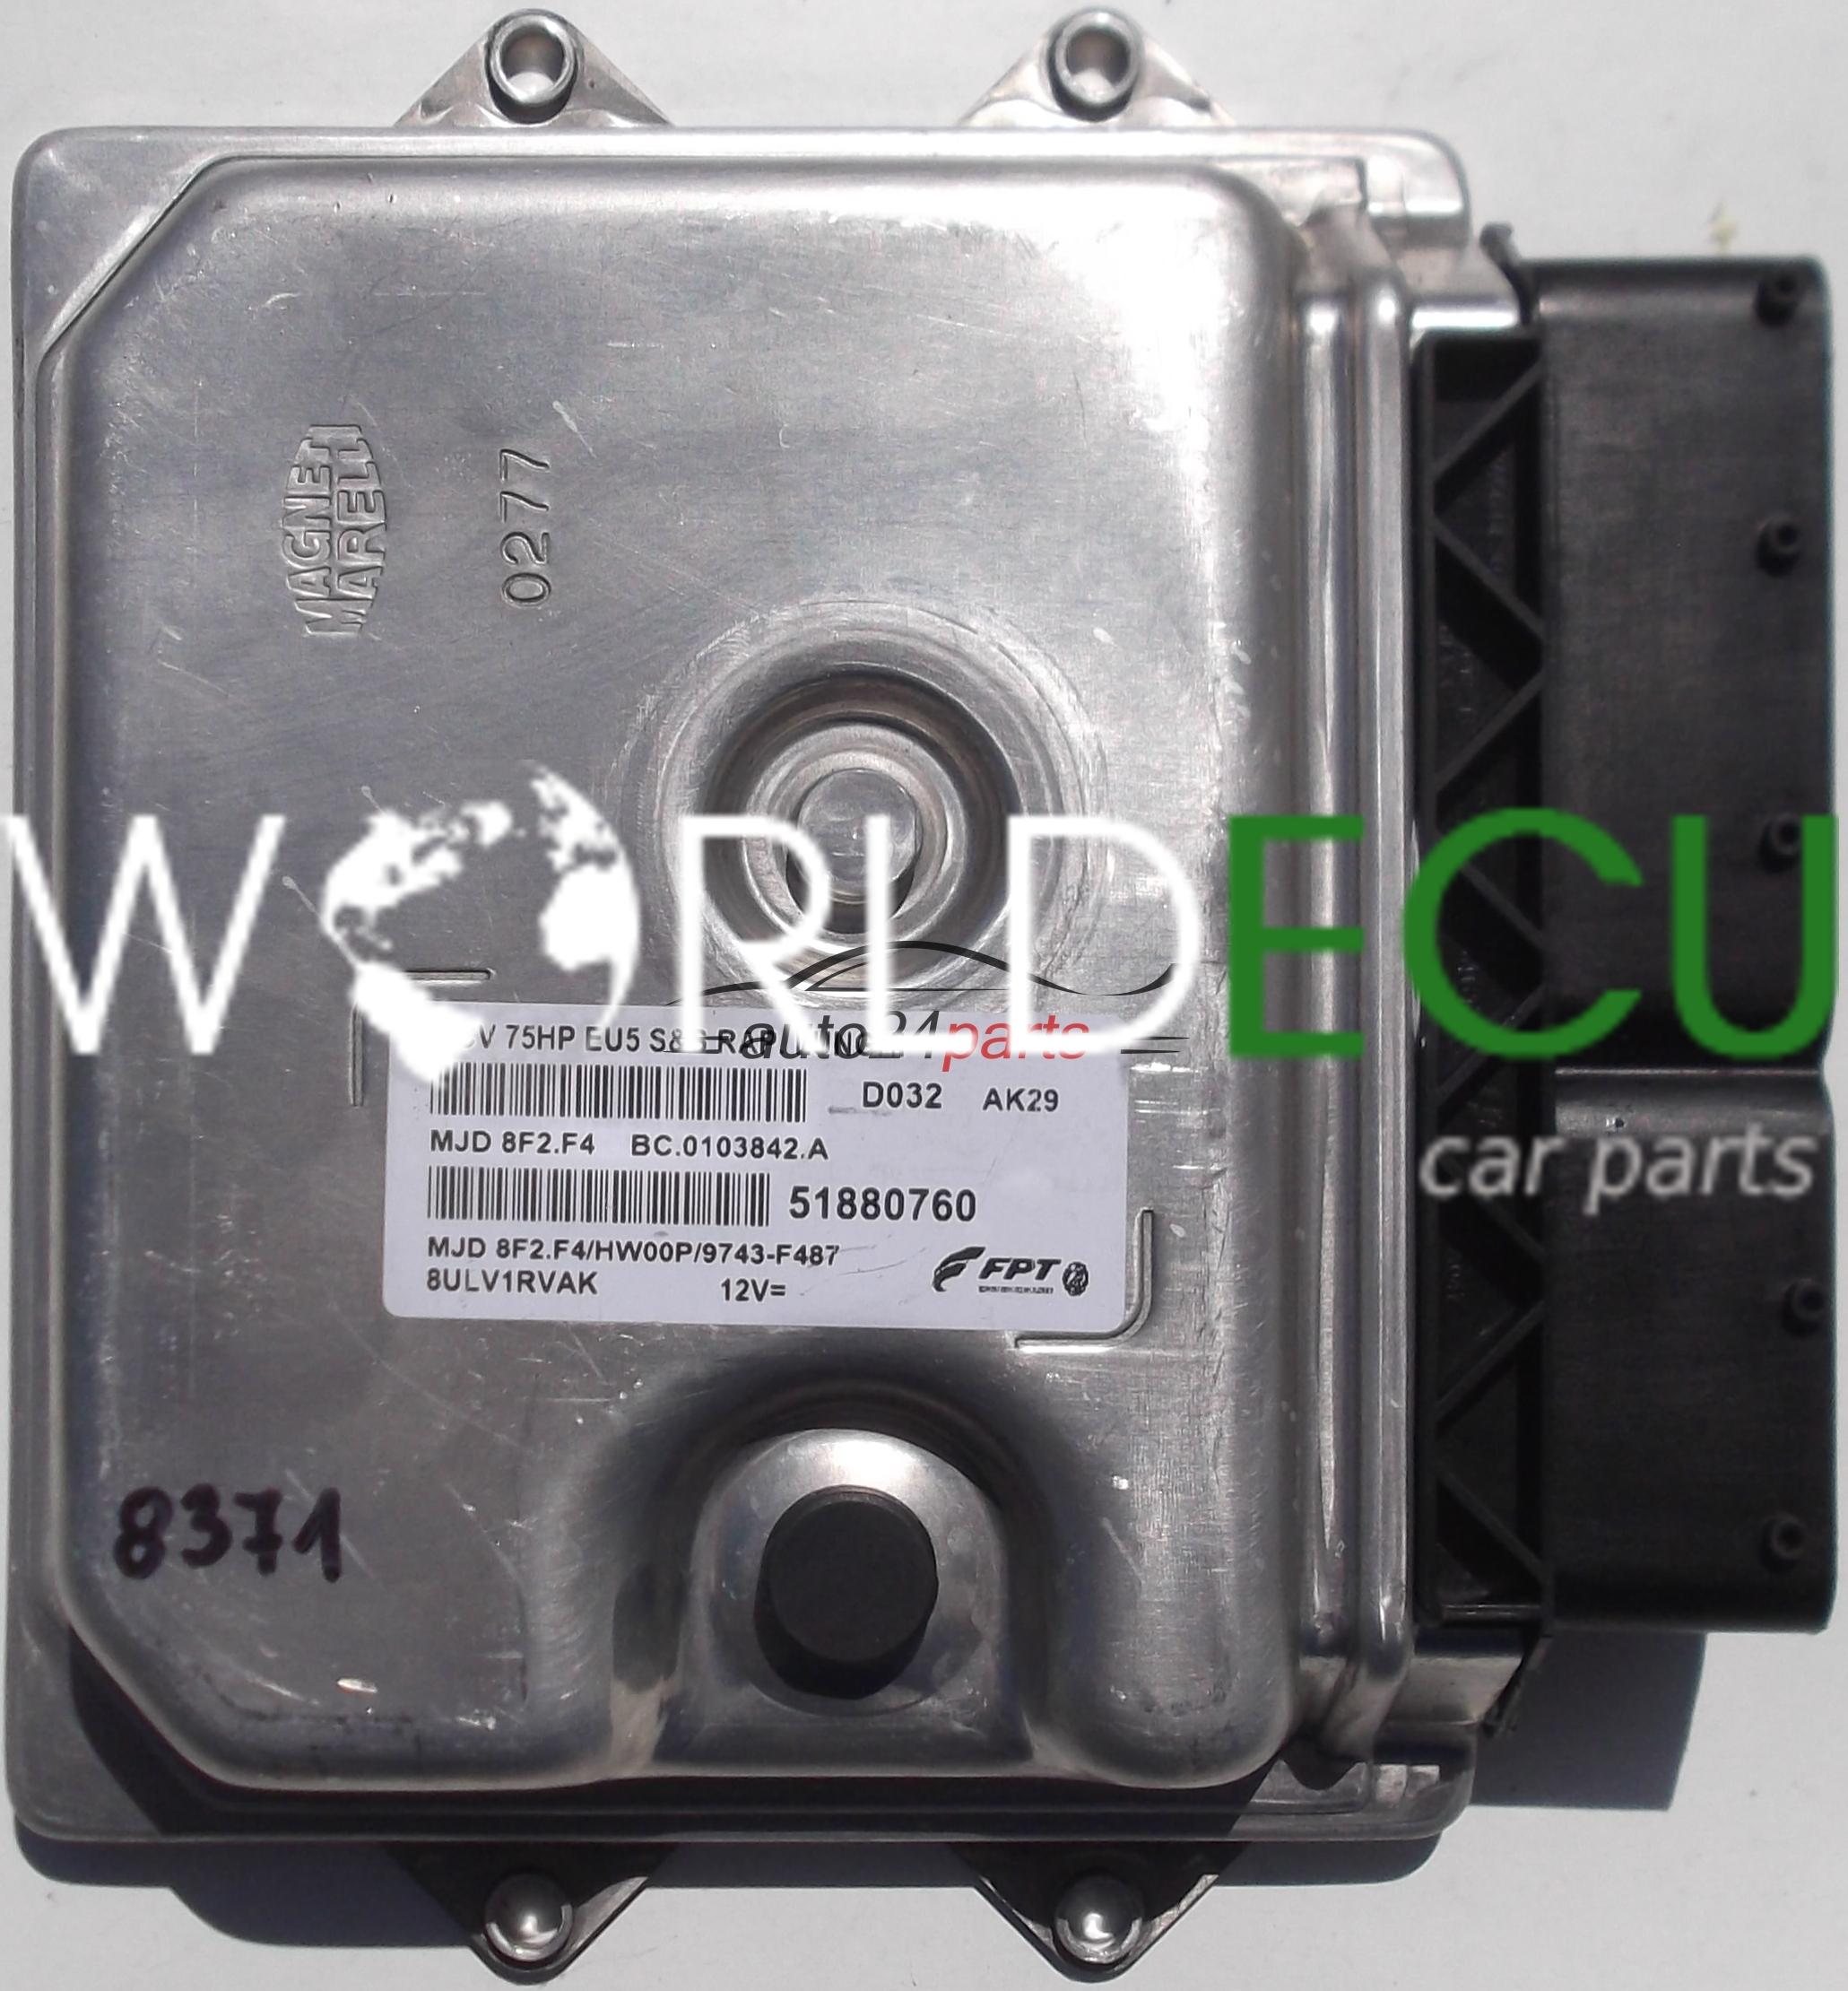 Ecu Engine Controller Fiat Fiorino 1 3  51880760  Mjd 8f2 F4  Mjd8f2f4  8ulv1rvak  Bc0103842a